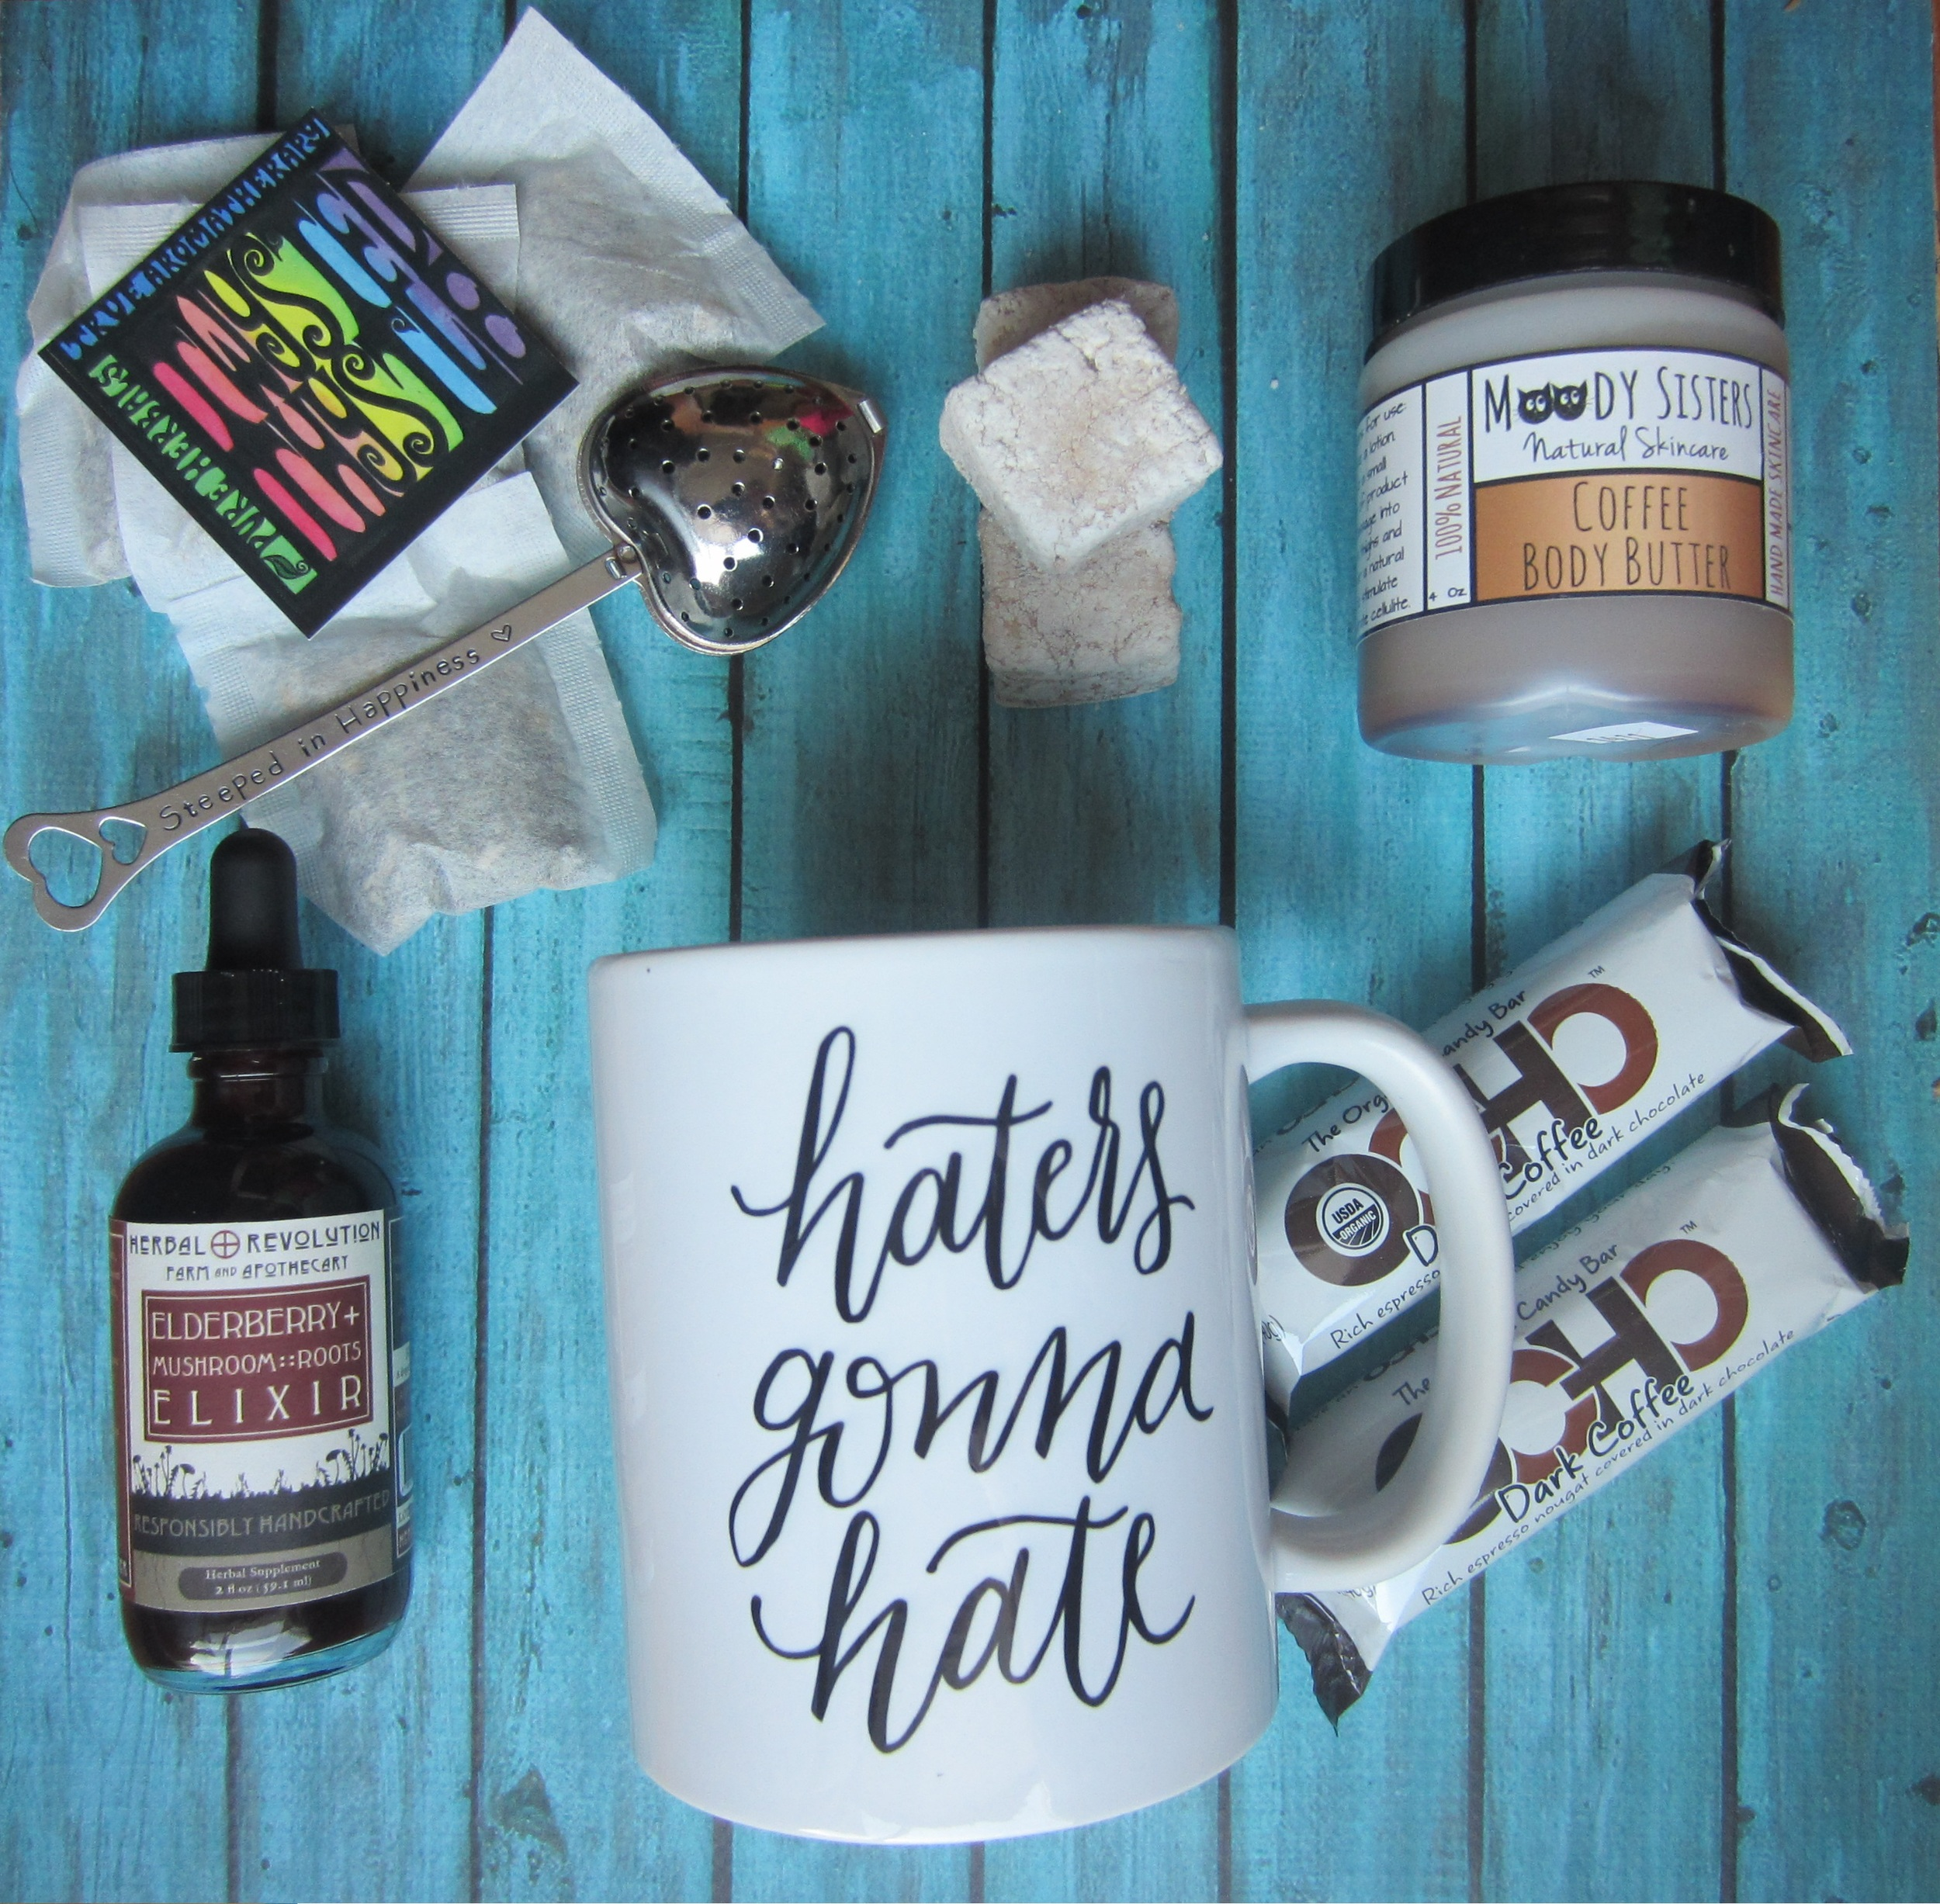 winters best coffee and tea handmade organic natural companies